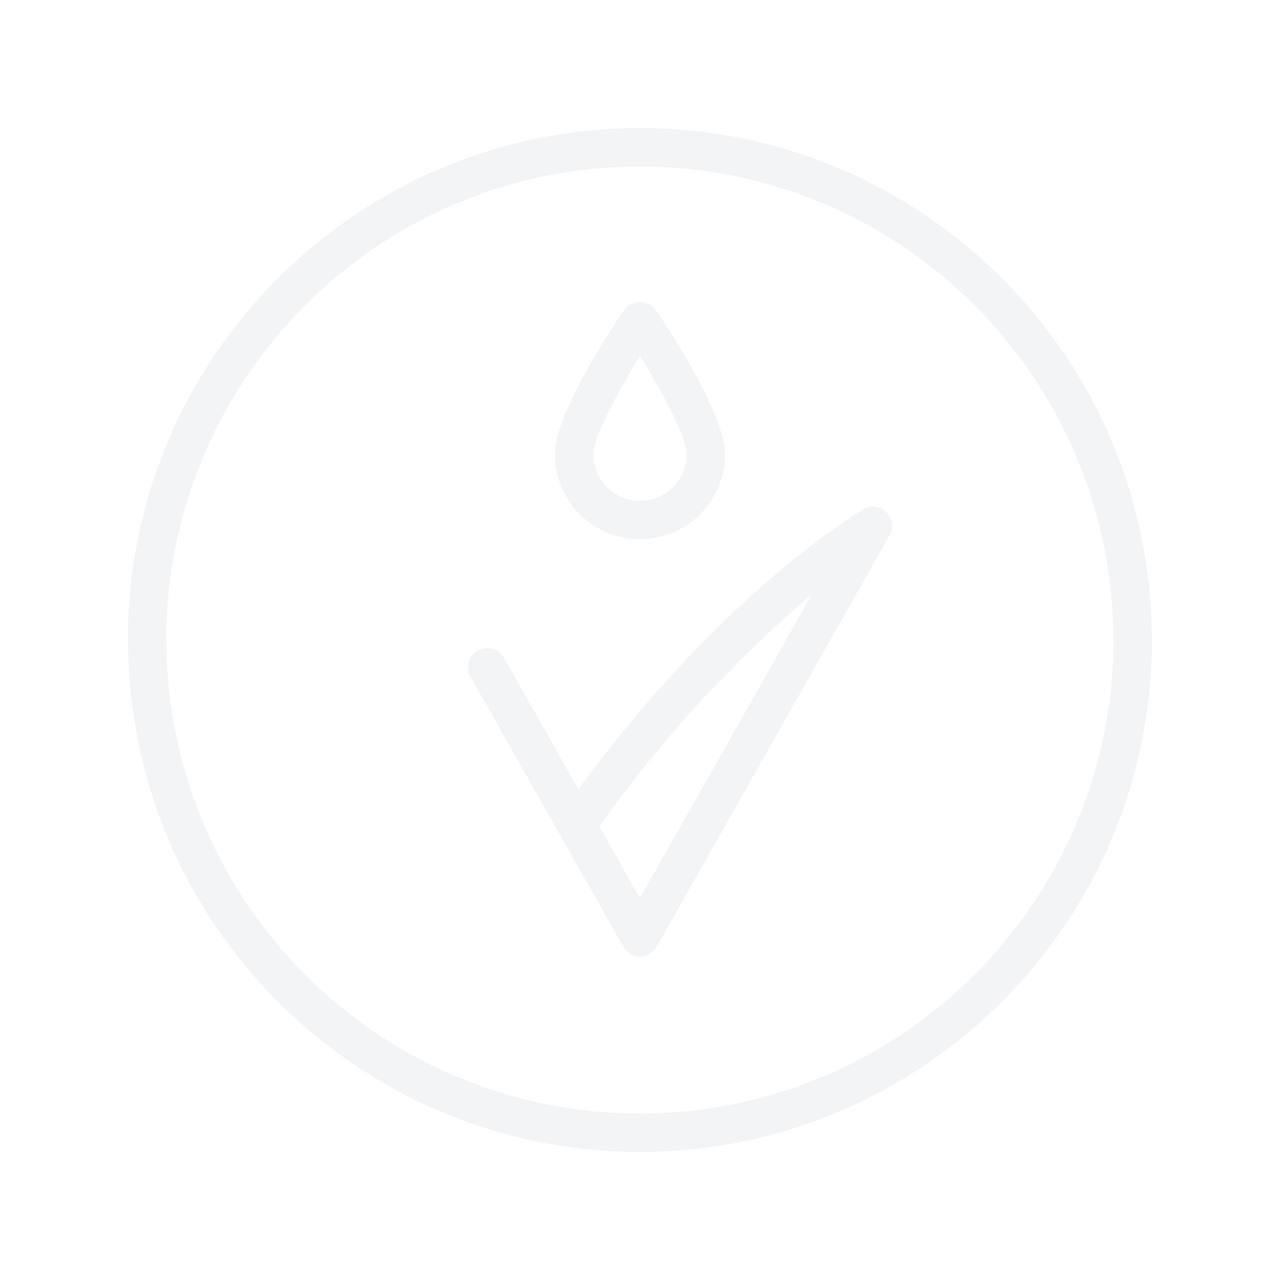 ELEMIS White Flowers Eye & Lip Makeup Remover 125ml